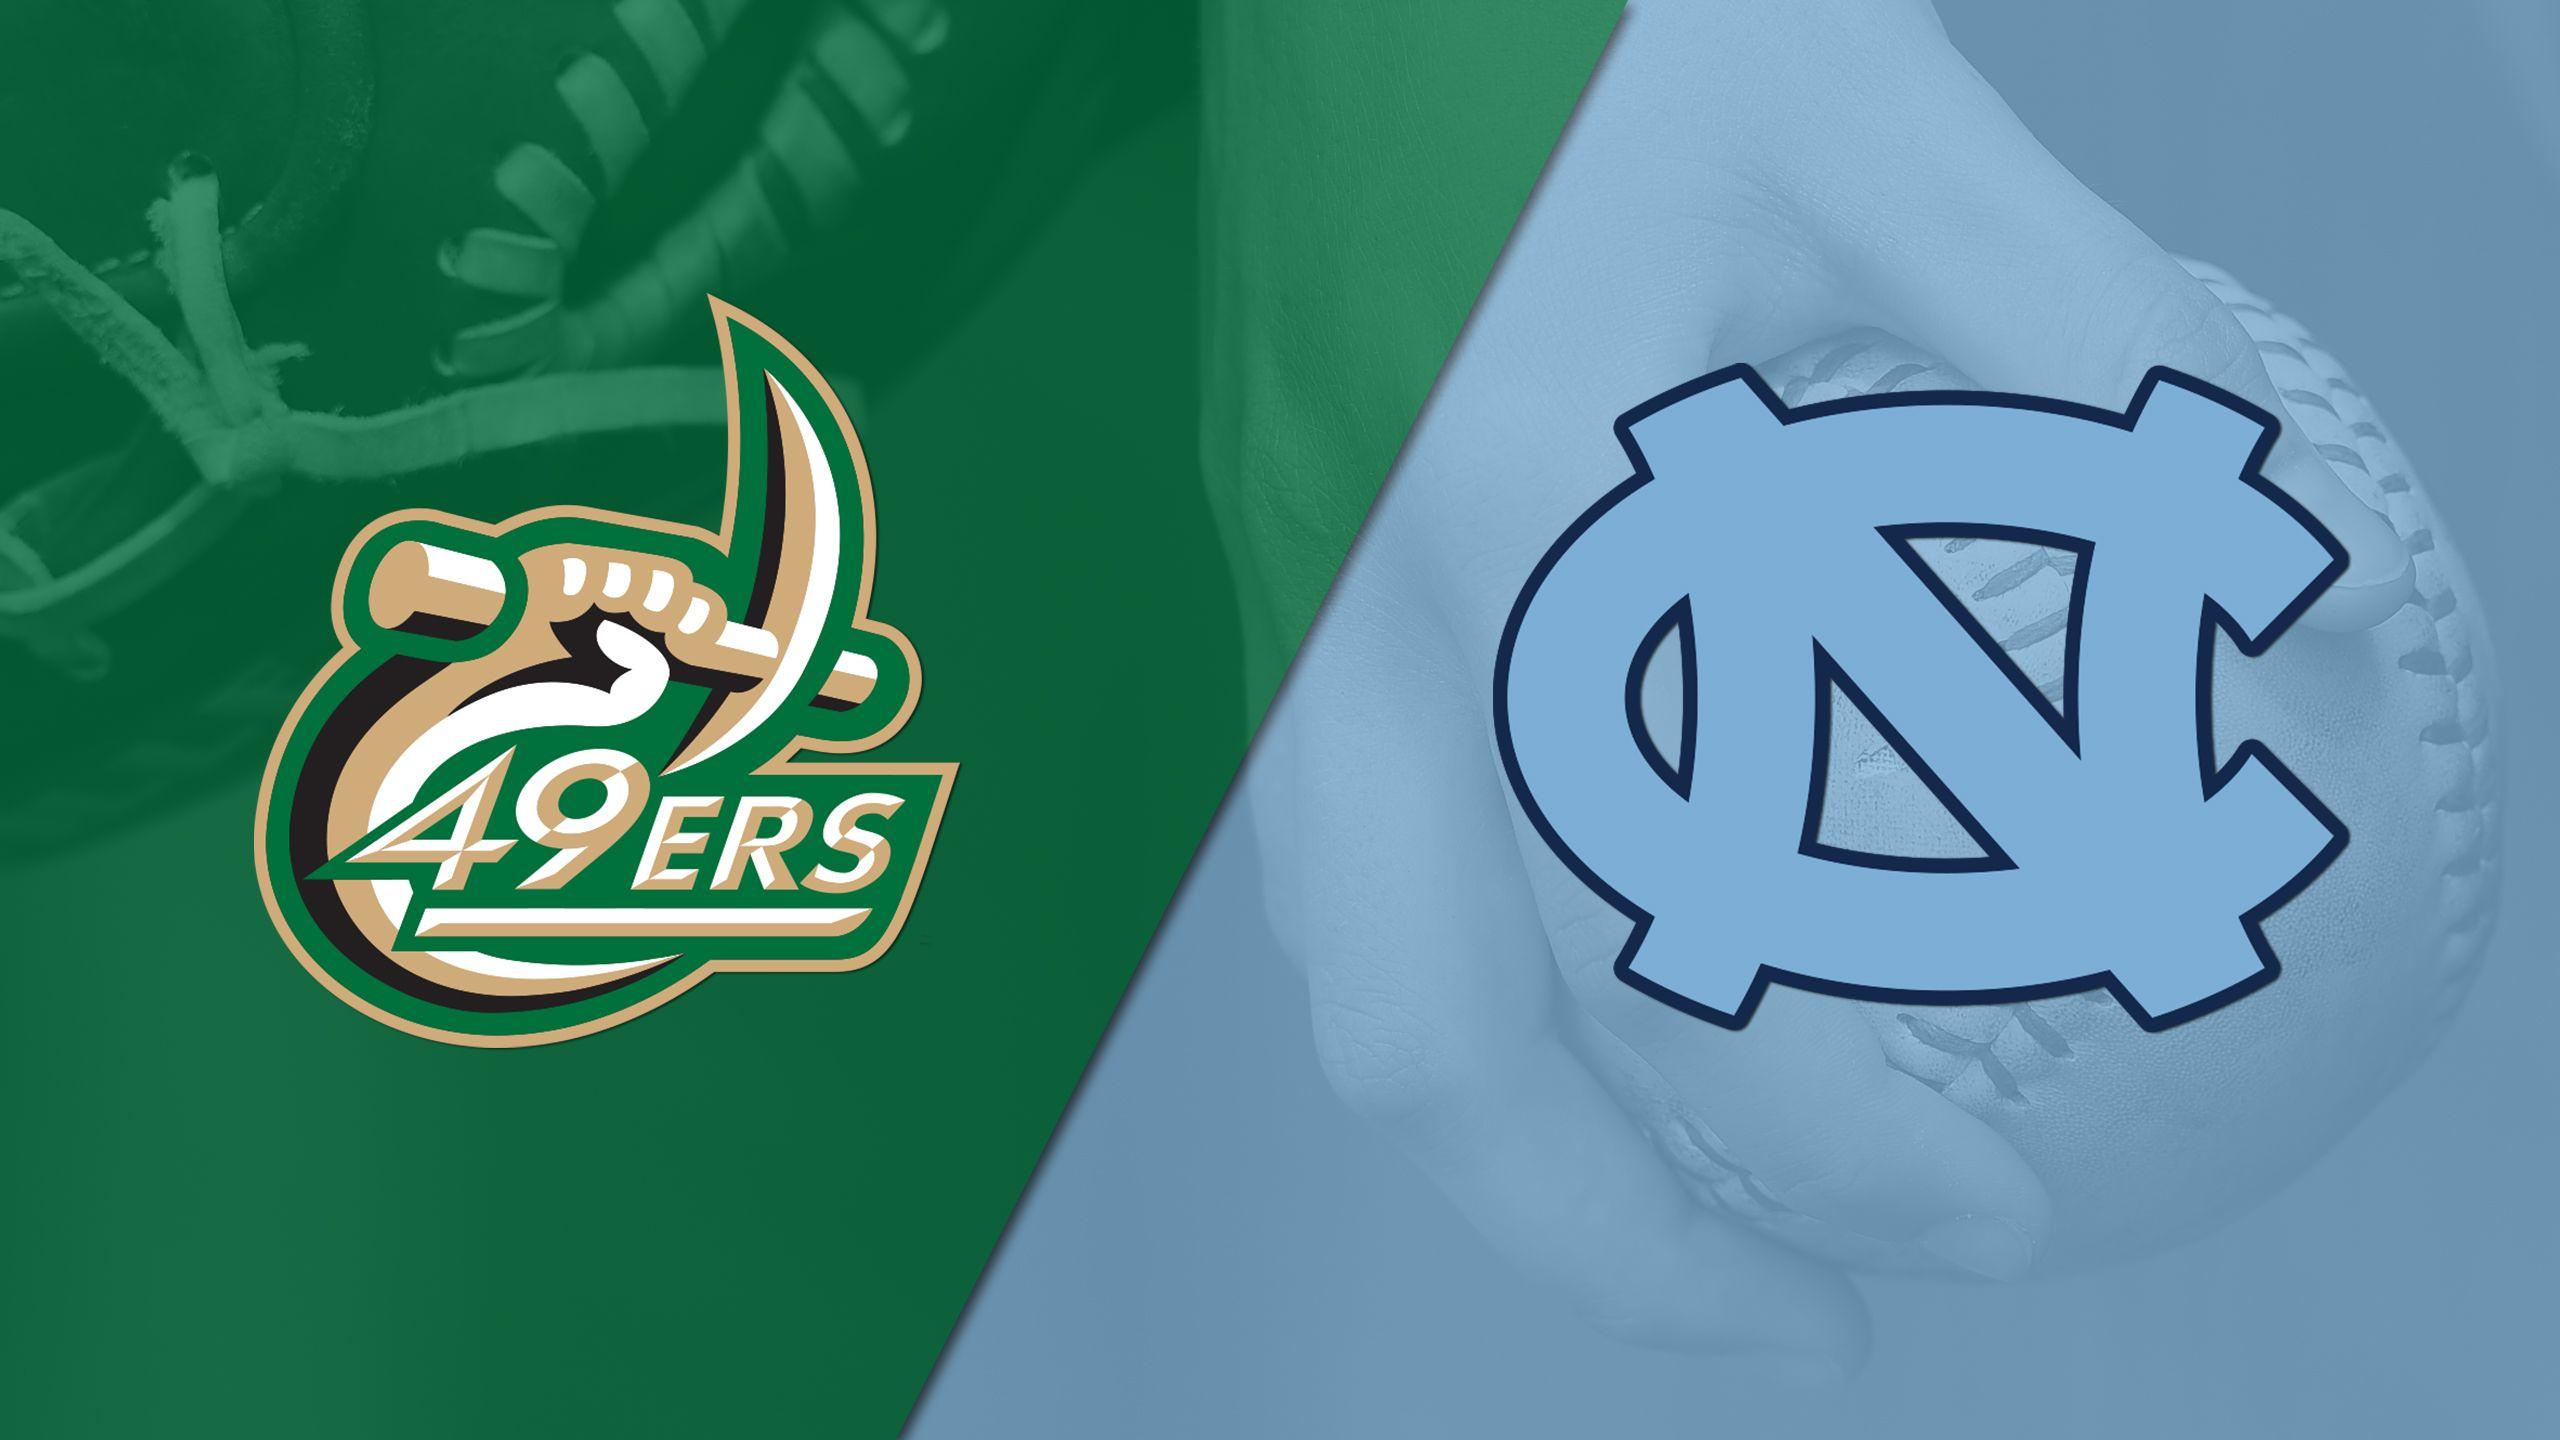 Charlotte vs. North Carolina (Softball)